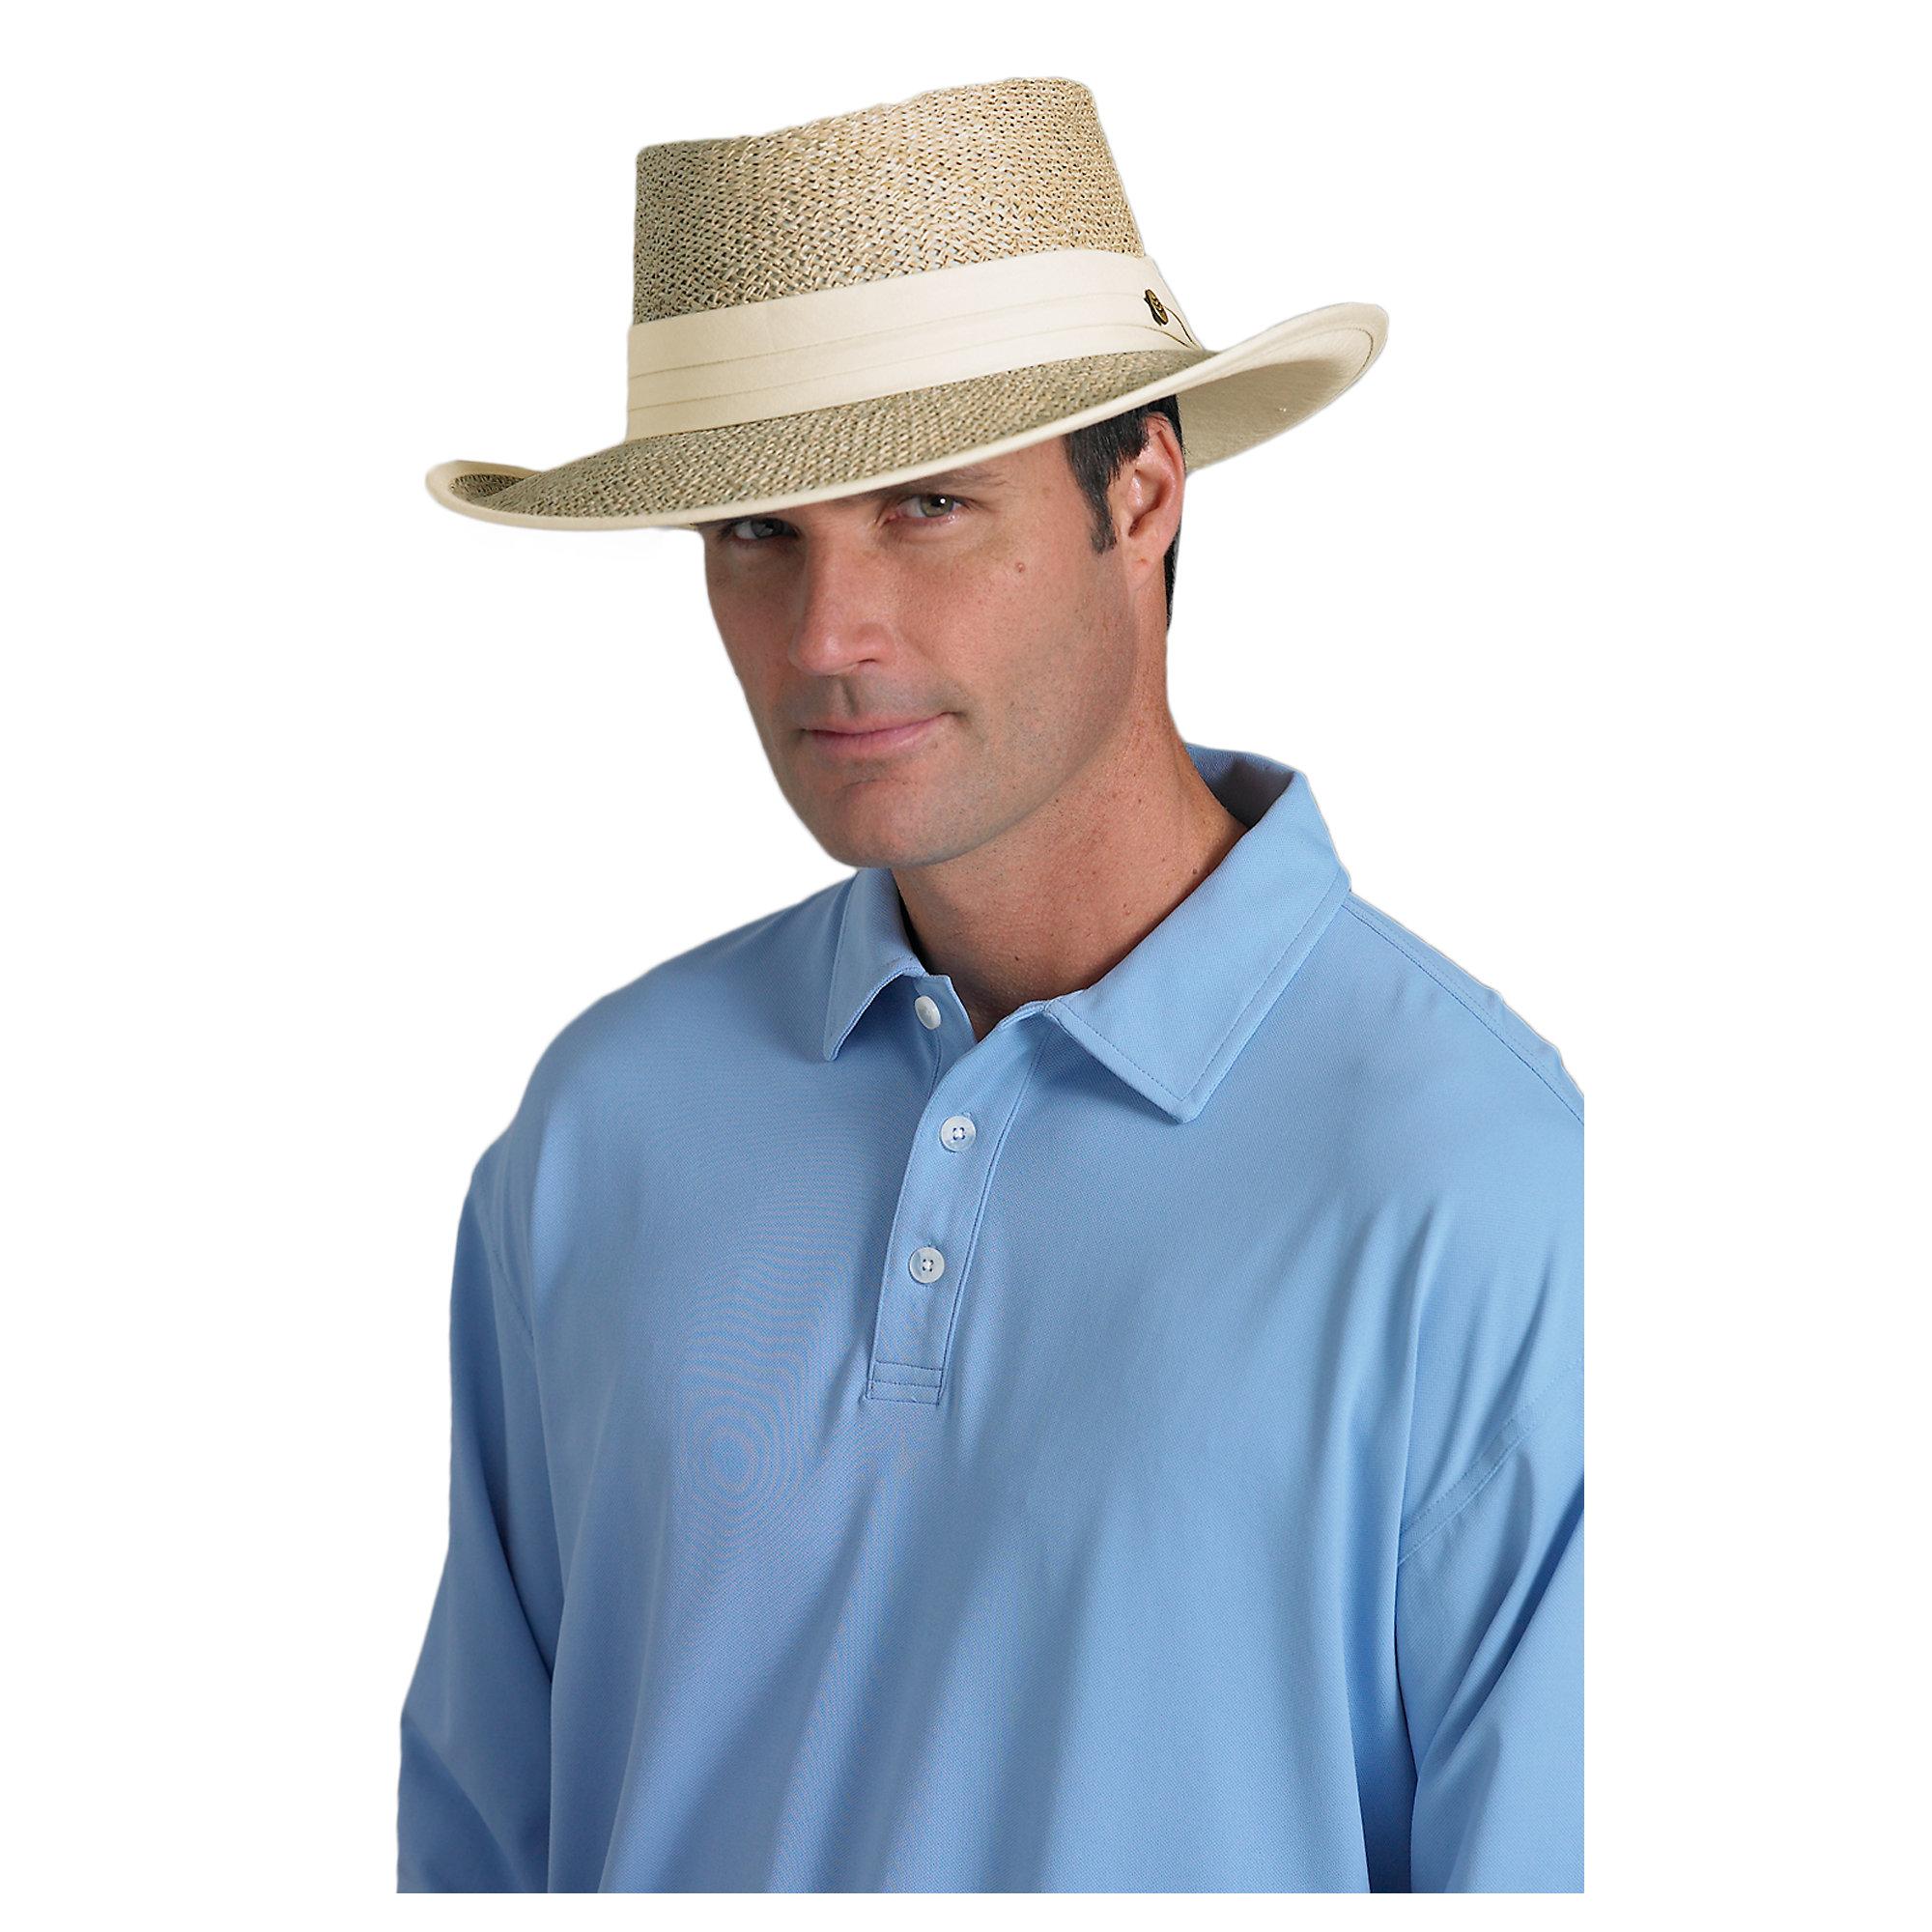 Coolibar upf 50 men 39 s golf sun protection hat ebay for Sun protection golf shirts